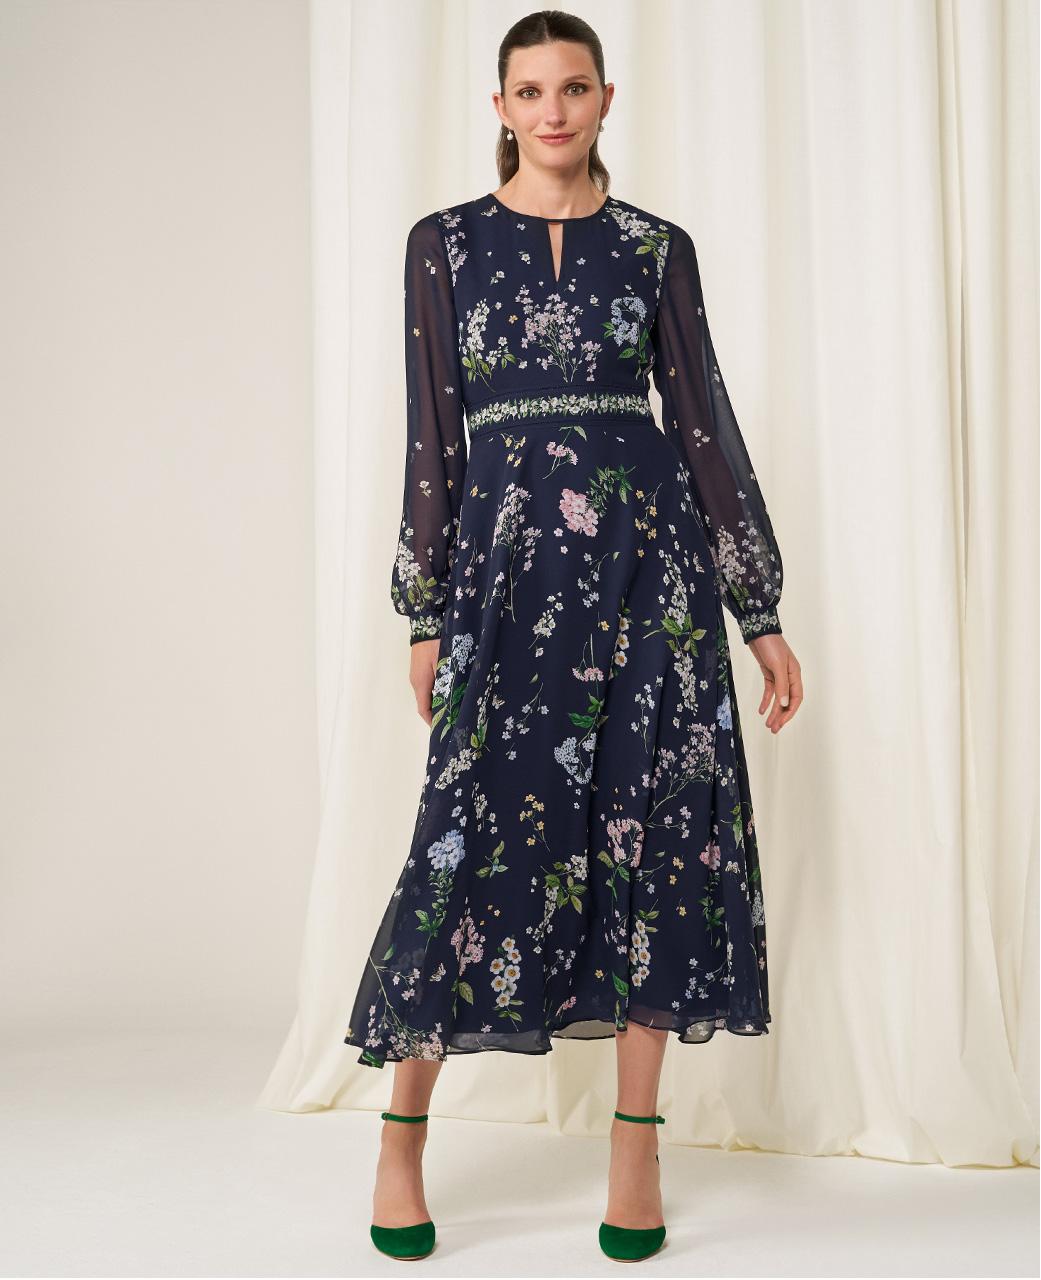 Hobbs Wedding Collection Navy Midi Floral Print Dress